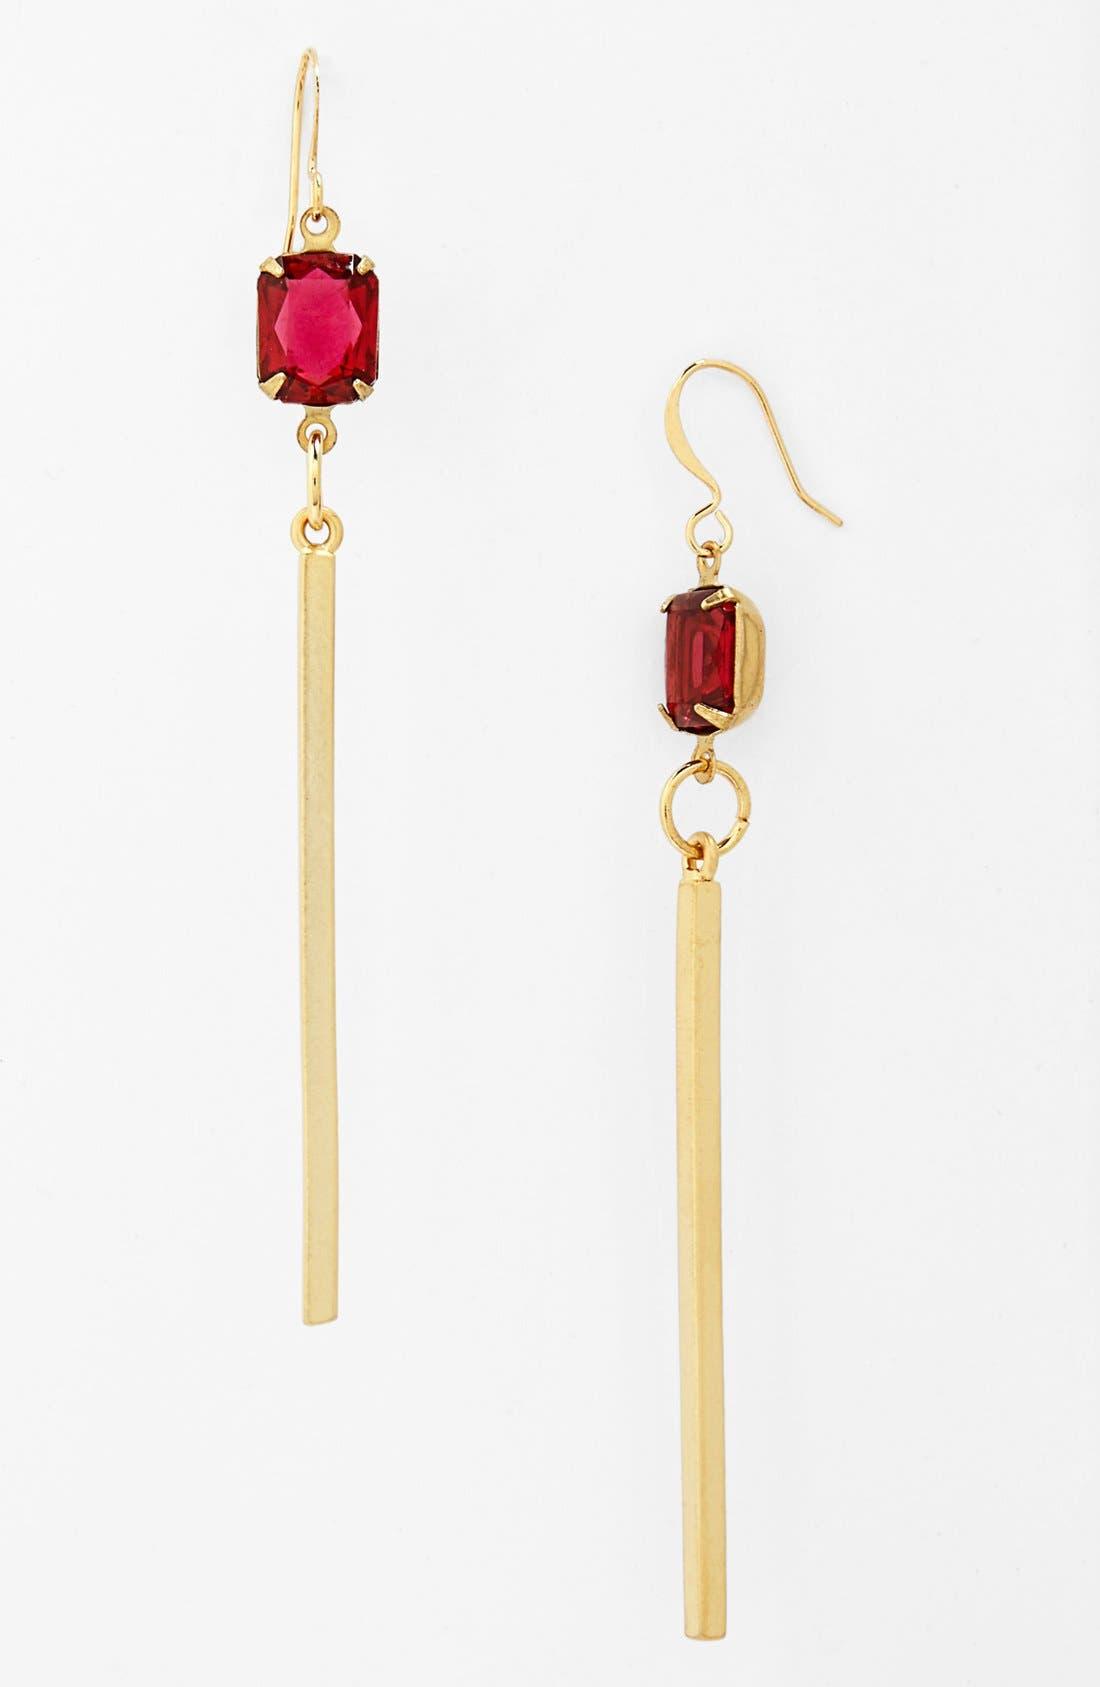 Main Image - Verdier Jewelry Pendant Earrings